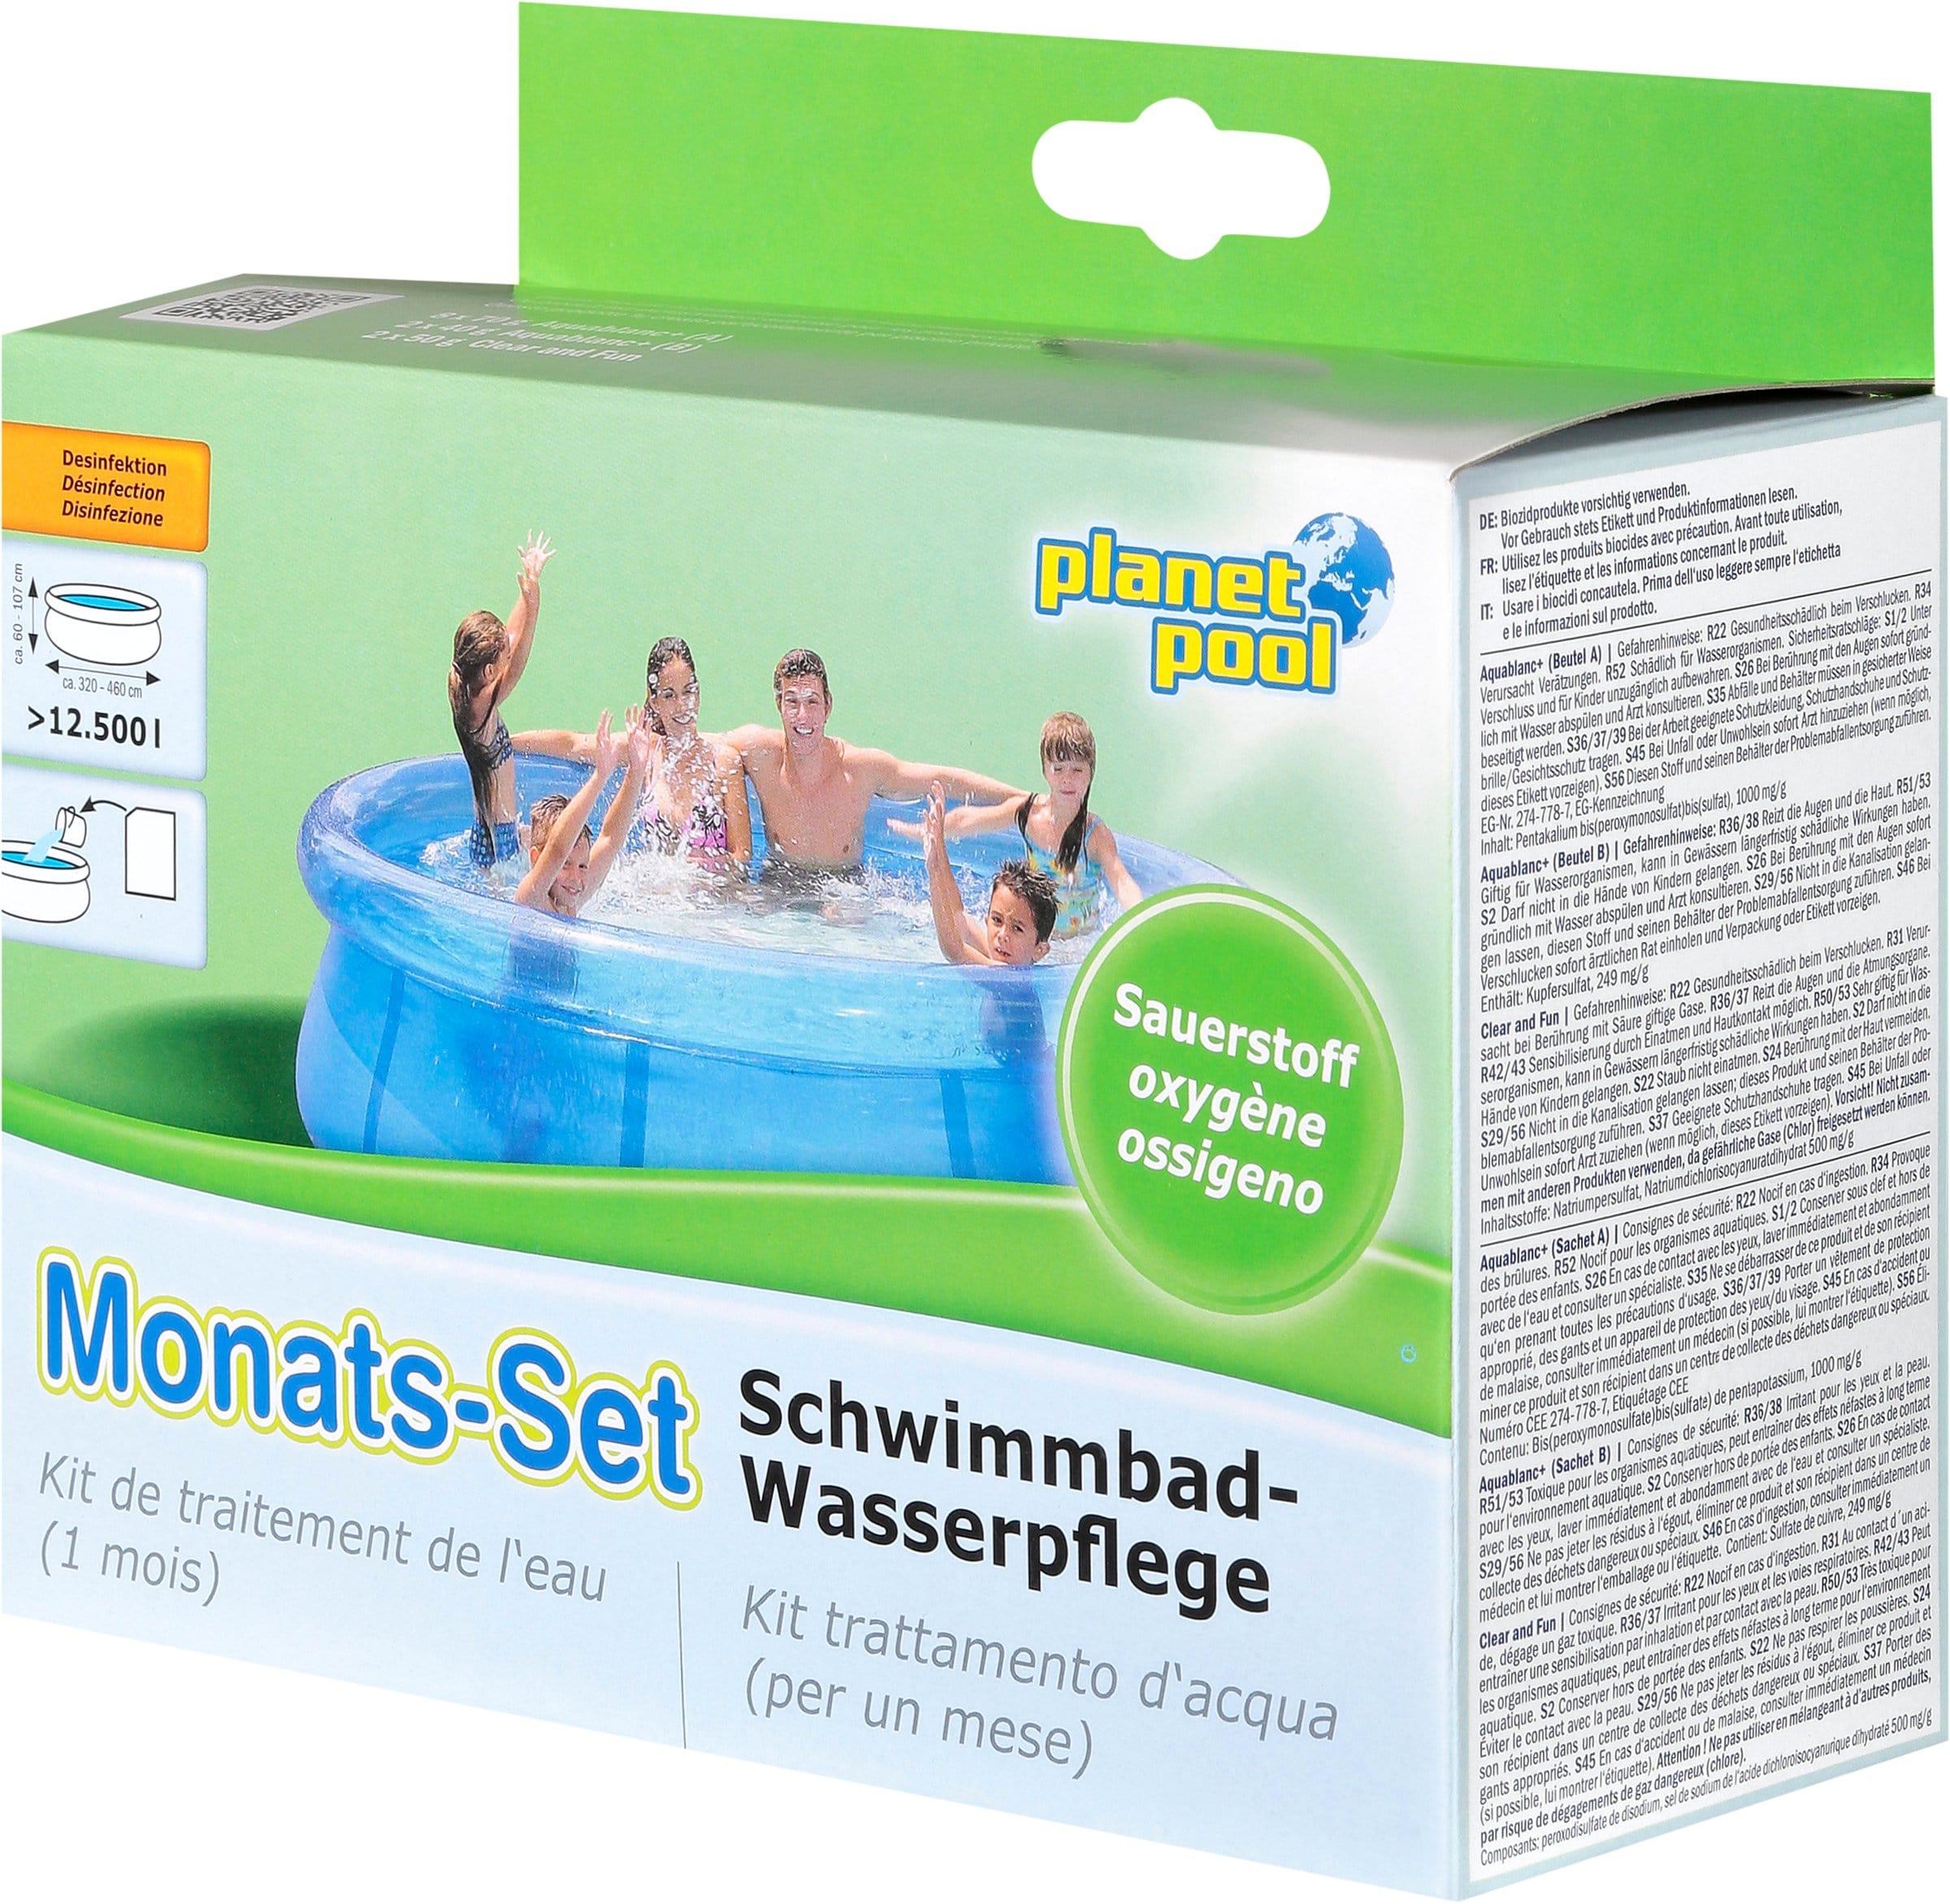 Planet Pool Kit per un mese ossigeno